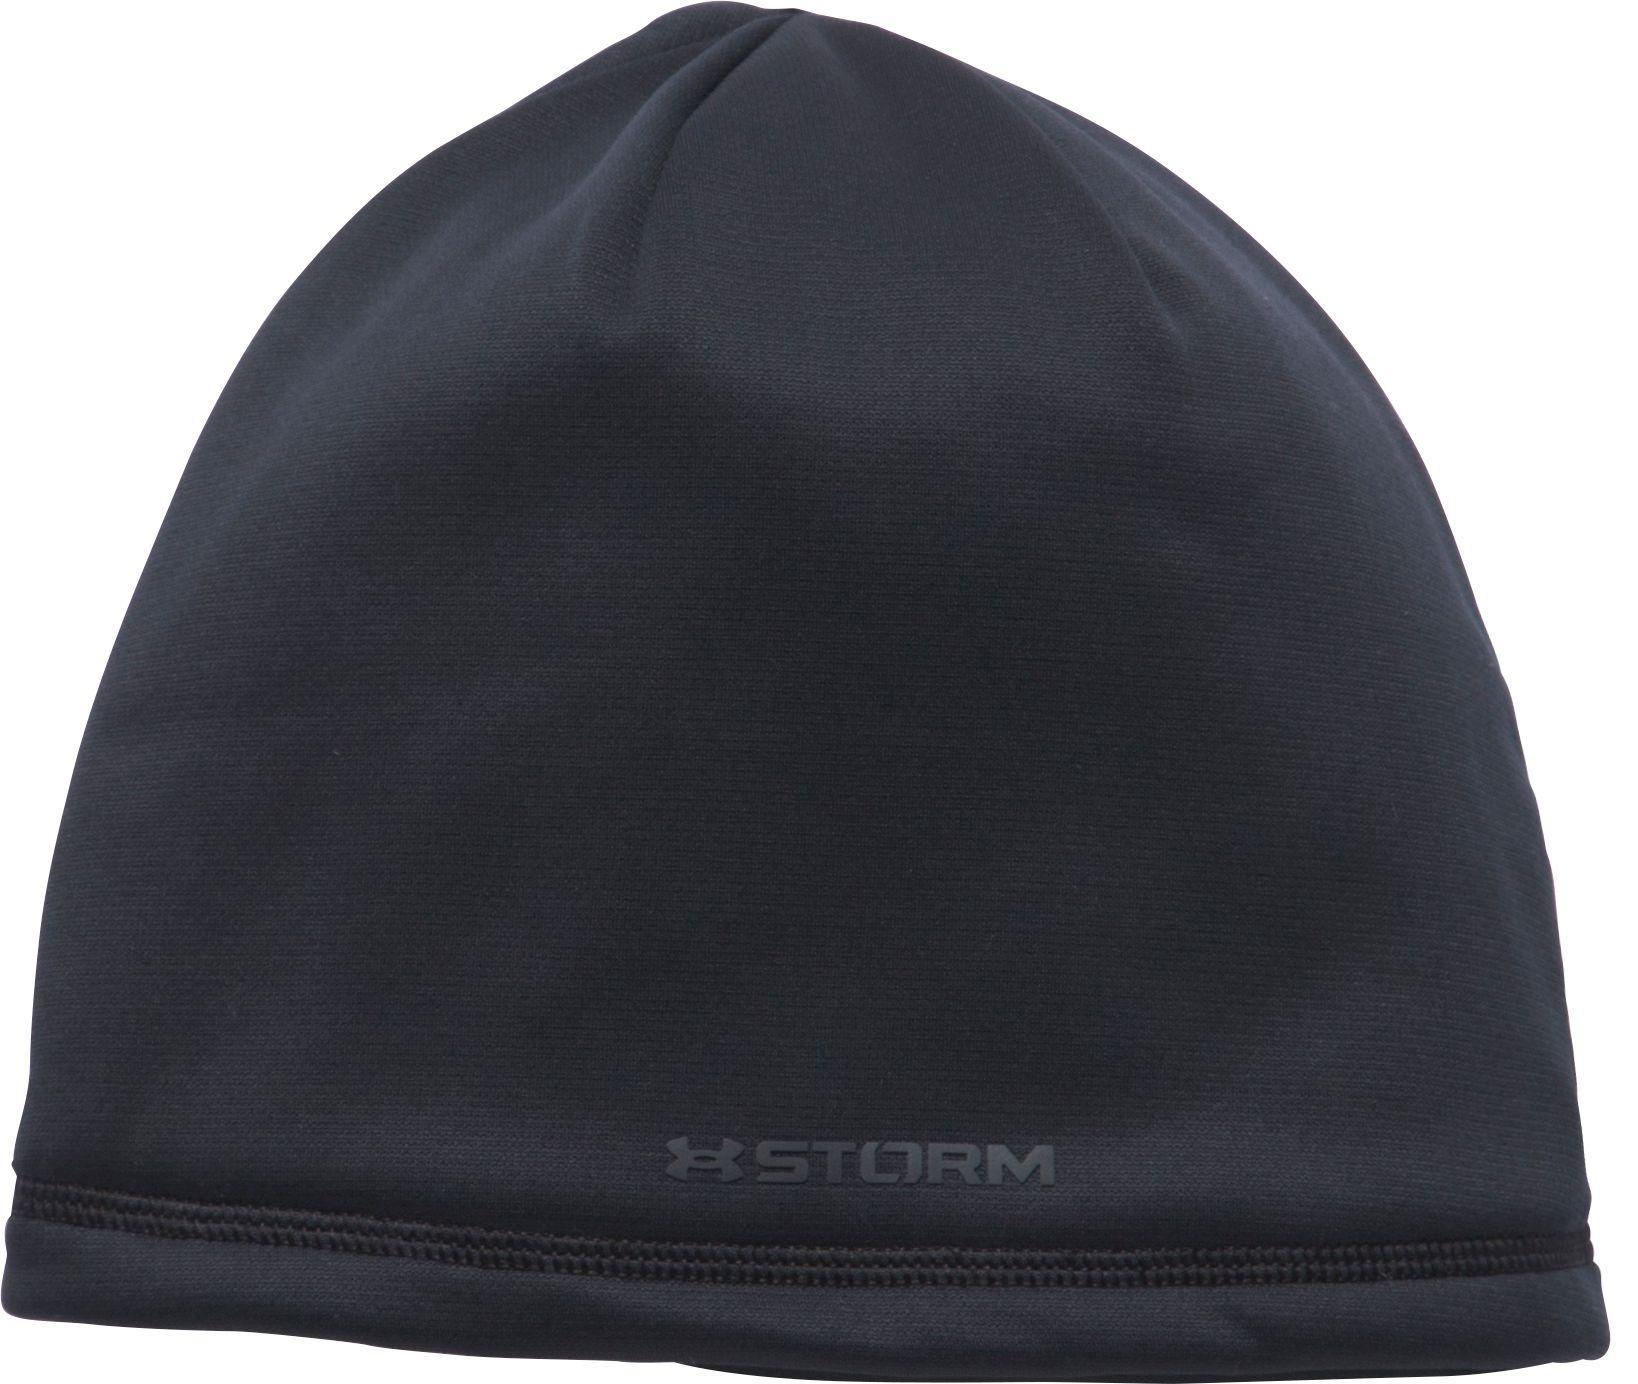 10414834112 Lyst - Under Armour Coldgear Reactor Elements Beanie in Black for Men